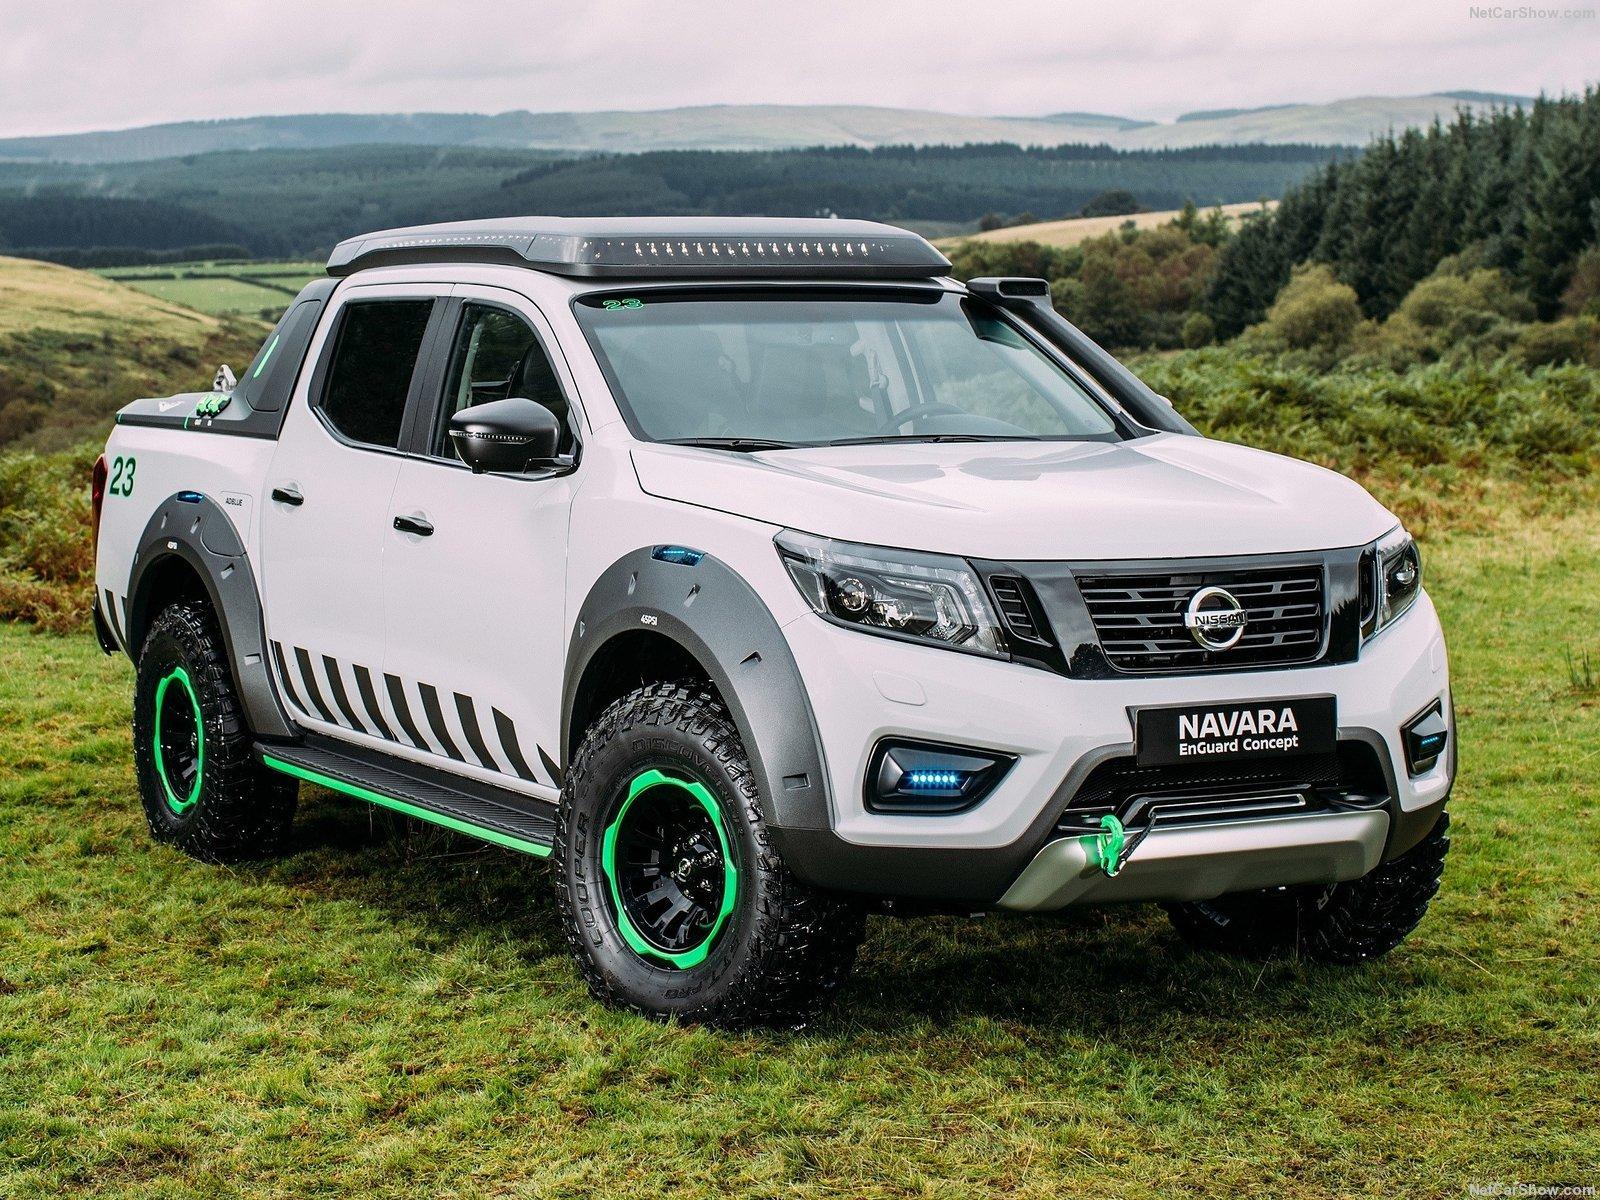 Nissan-Navara_EnGuard_Concept-2016-1600-01.jpg